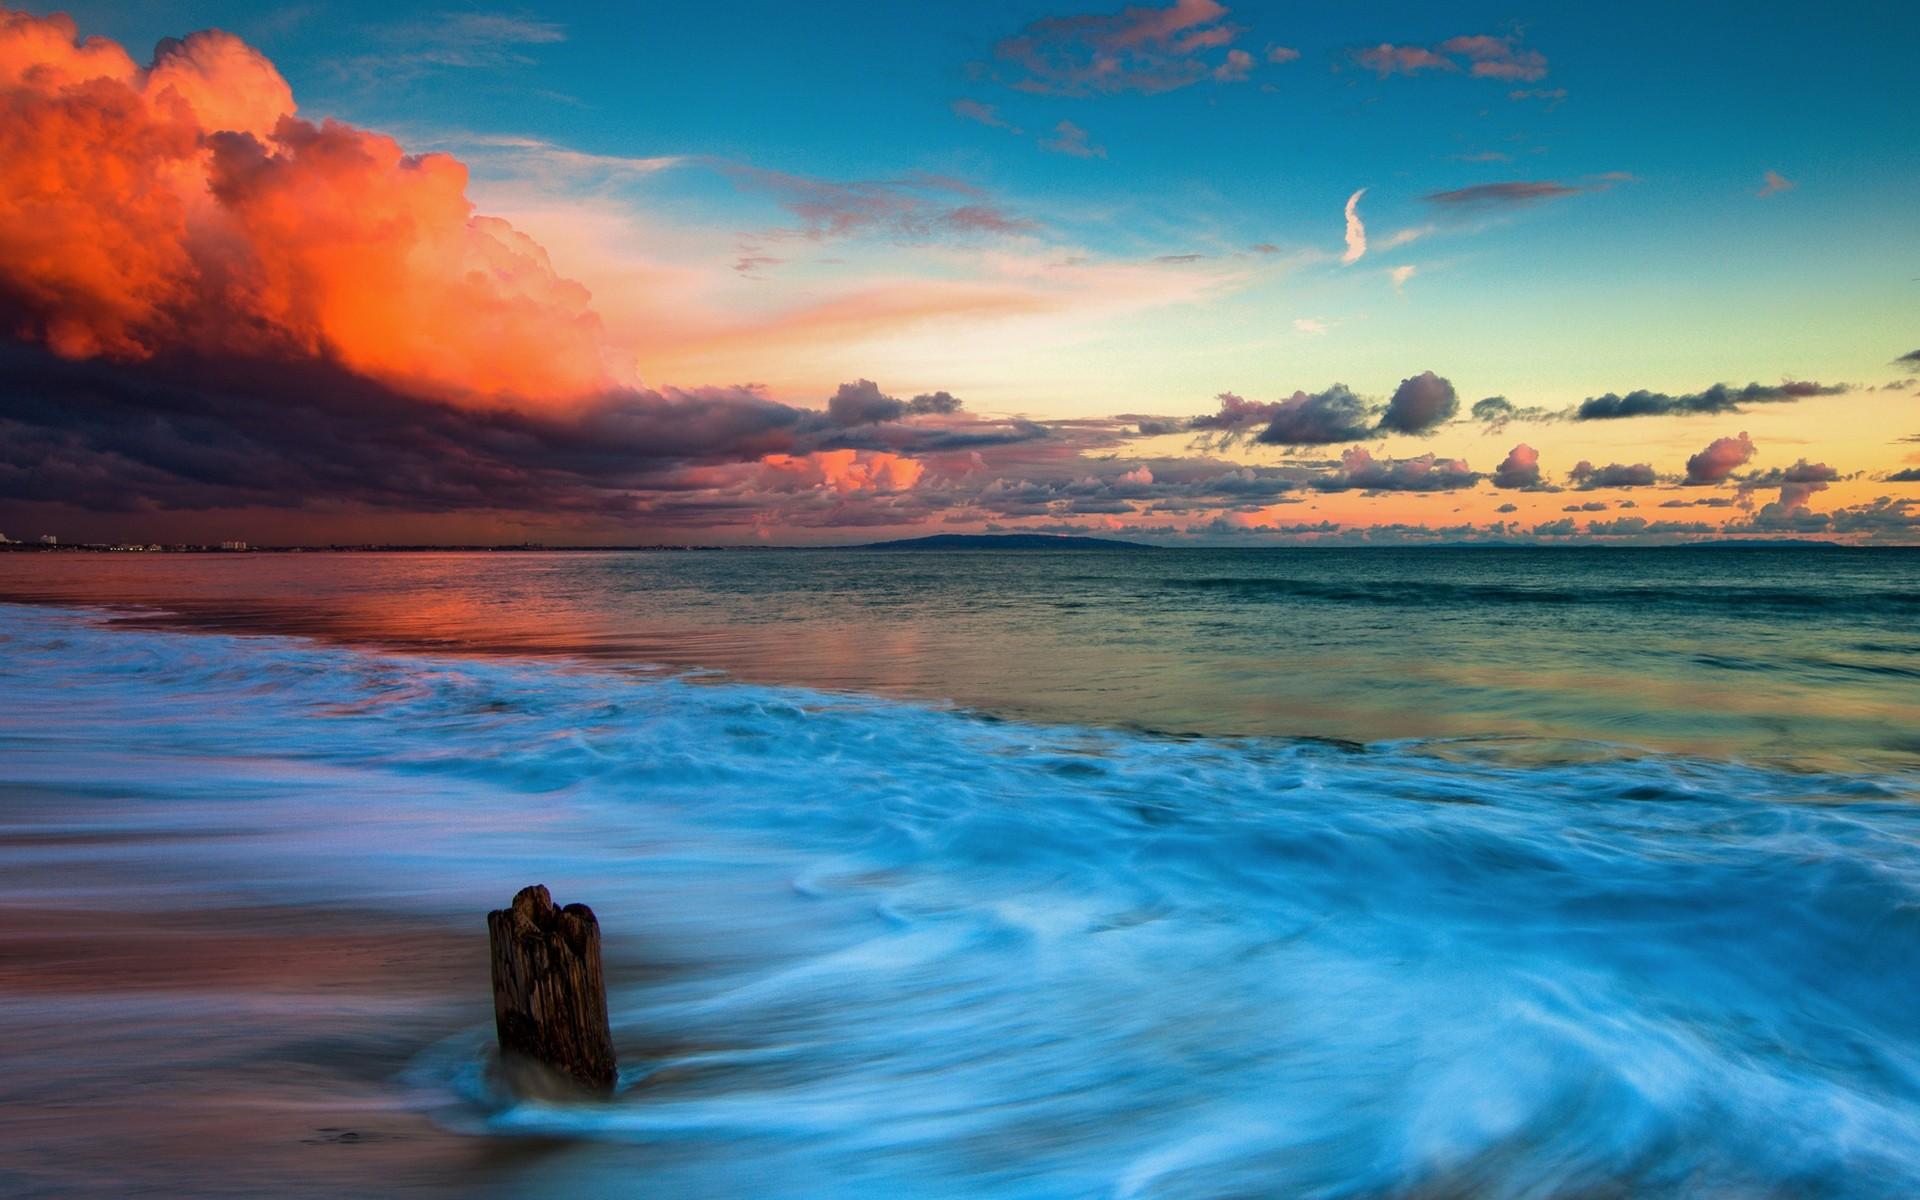 beach pictures wallpaper,sky,body of water,nature,sea,horizon